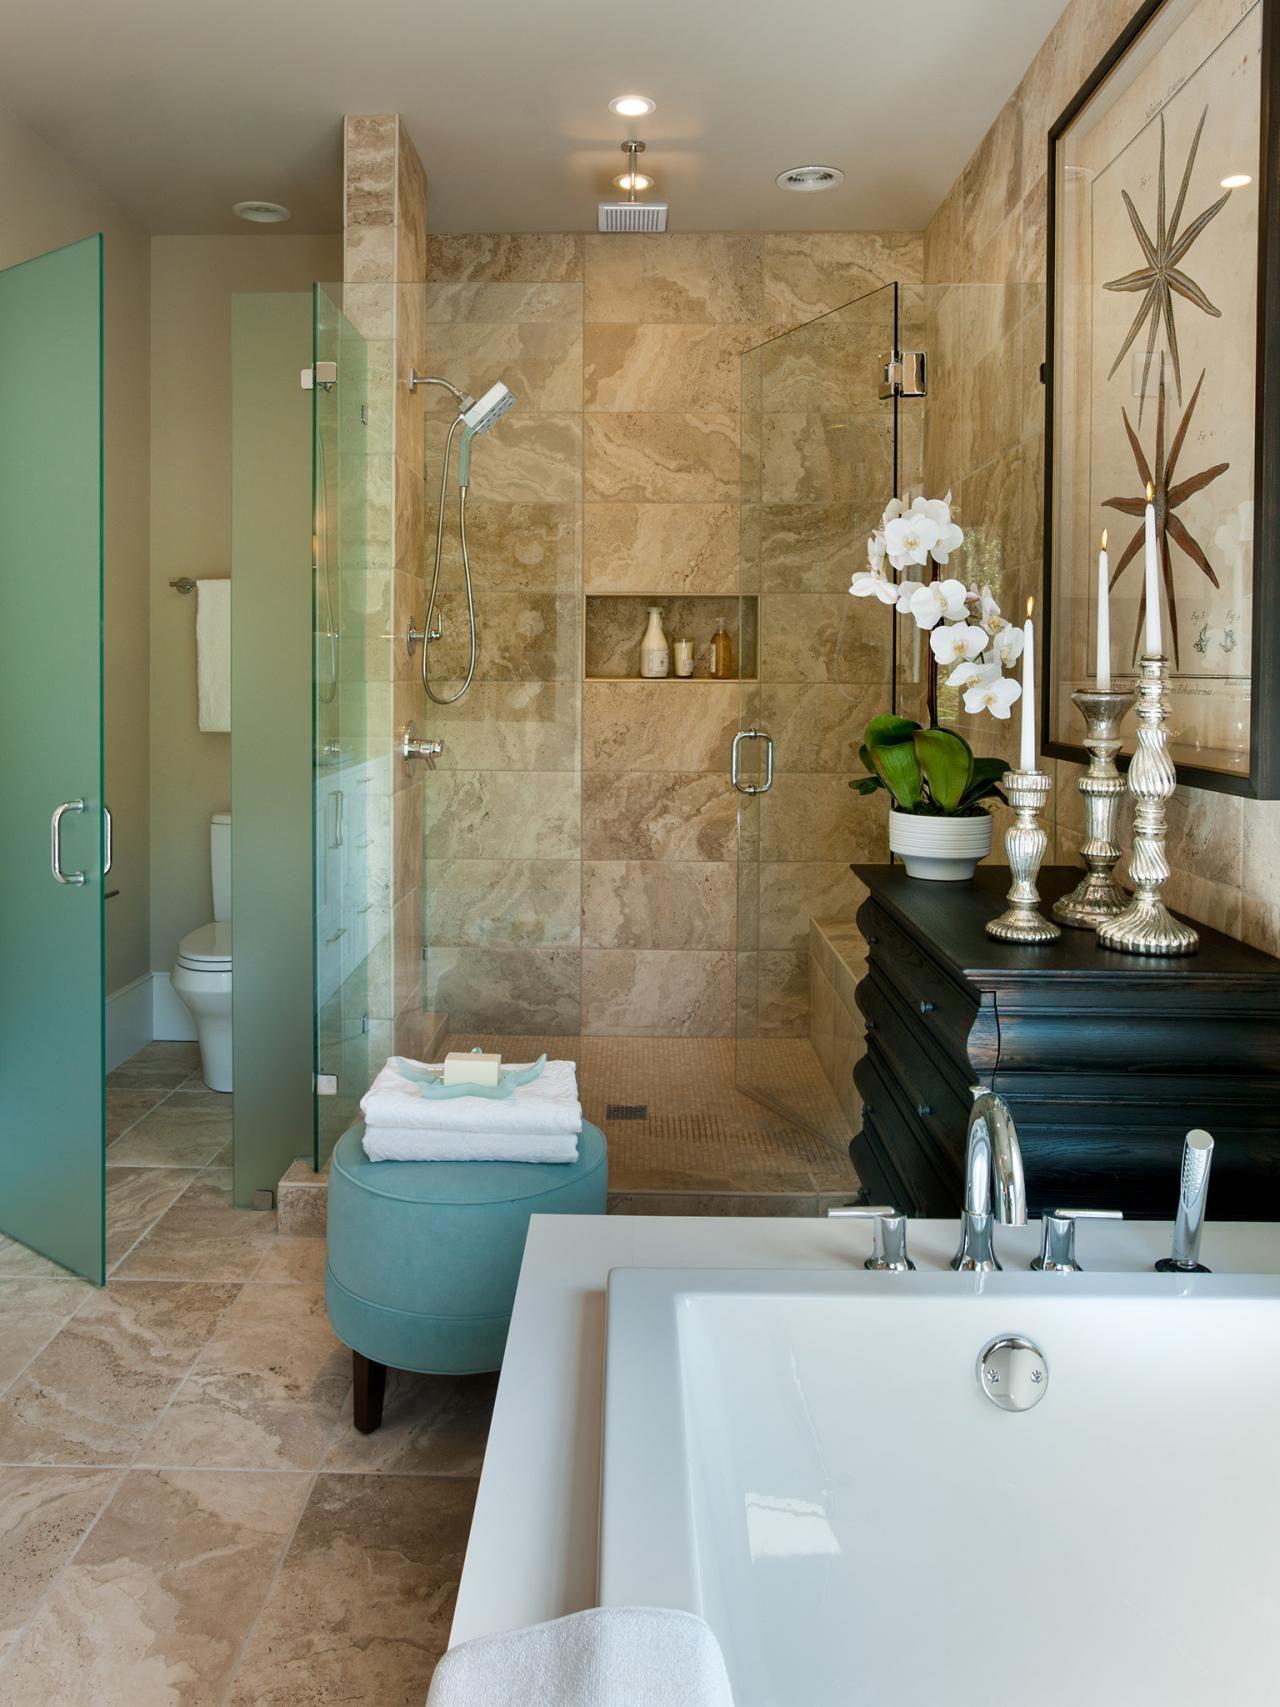 bathroom pictures: 99 stylish design ideas you'll love | bathroom